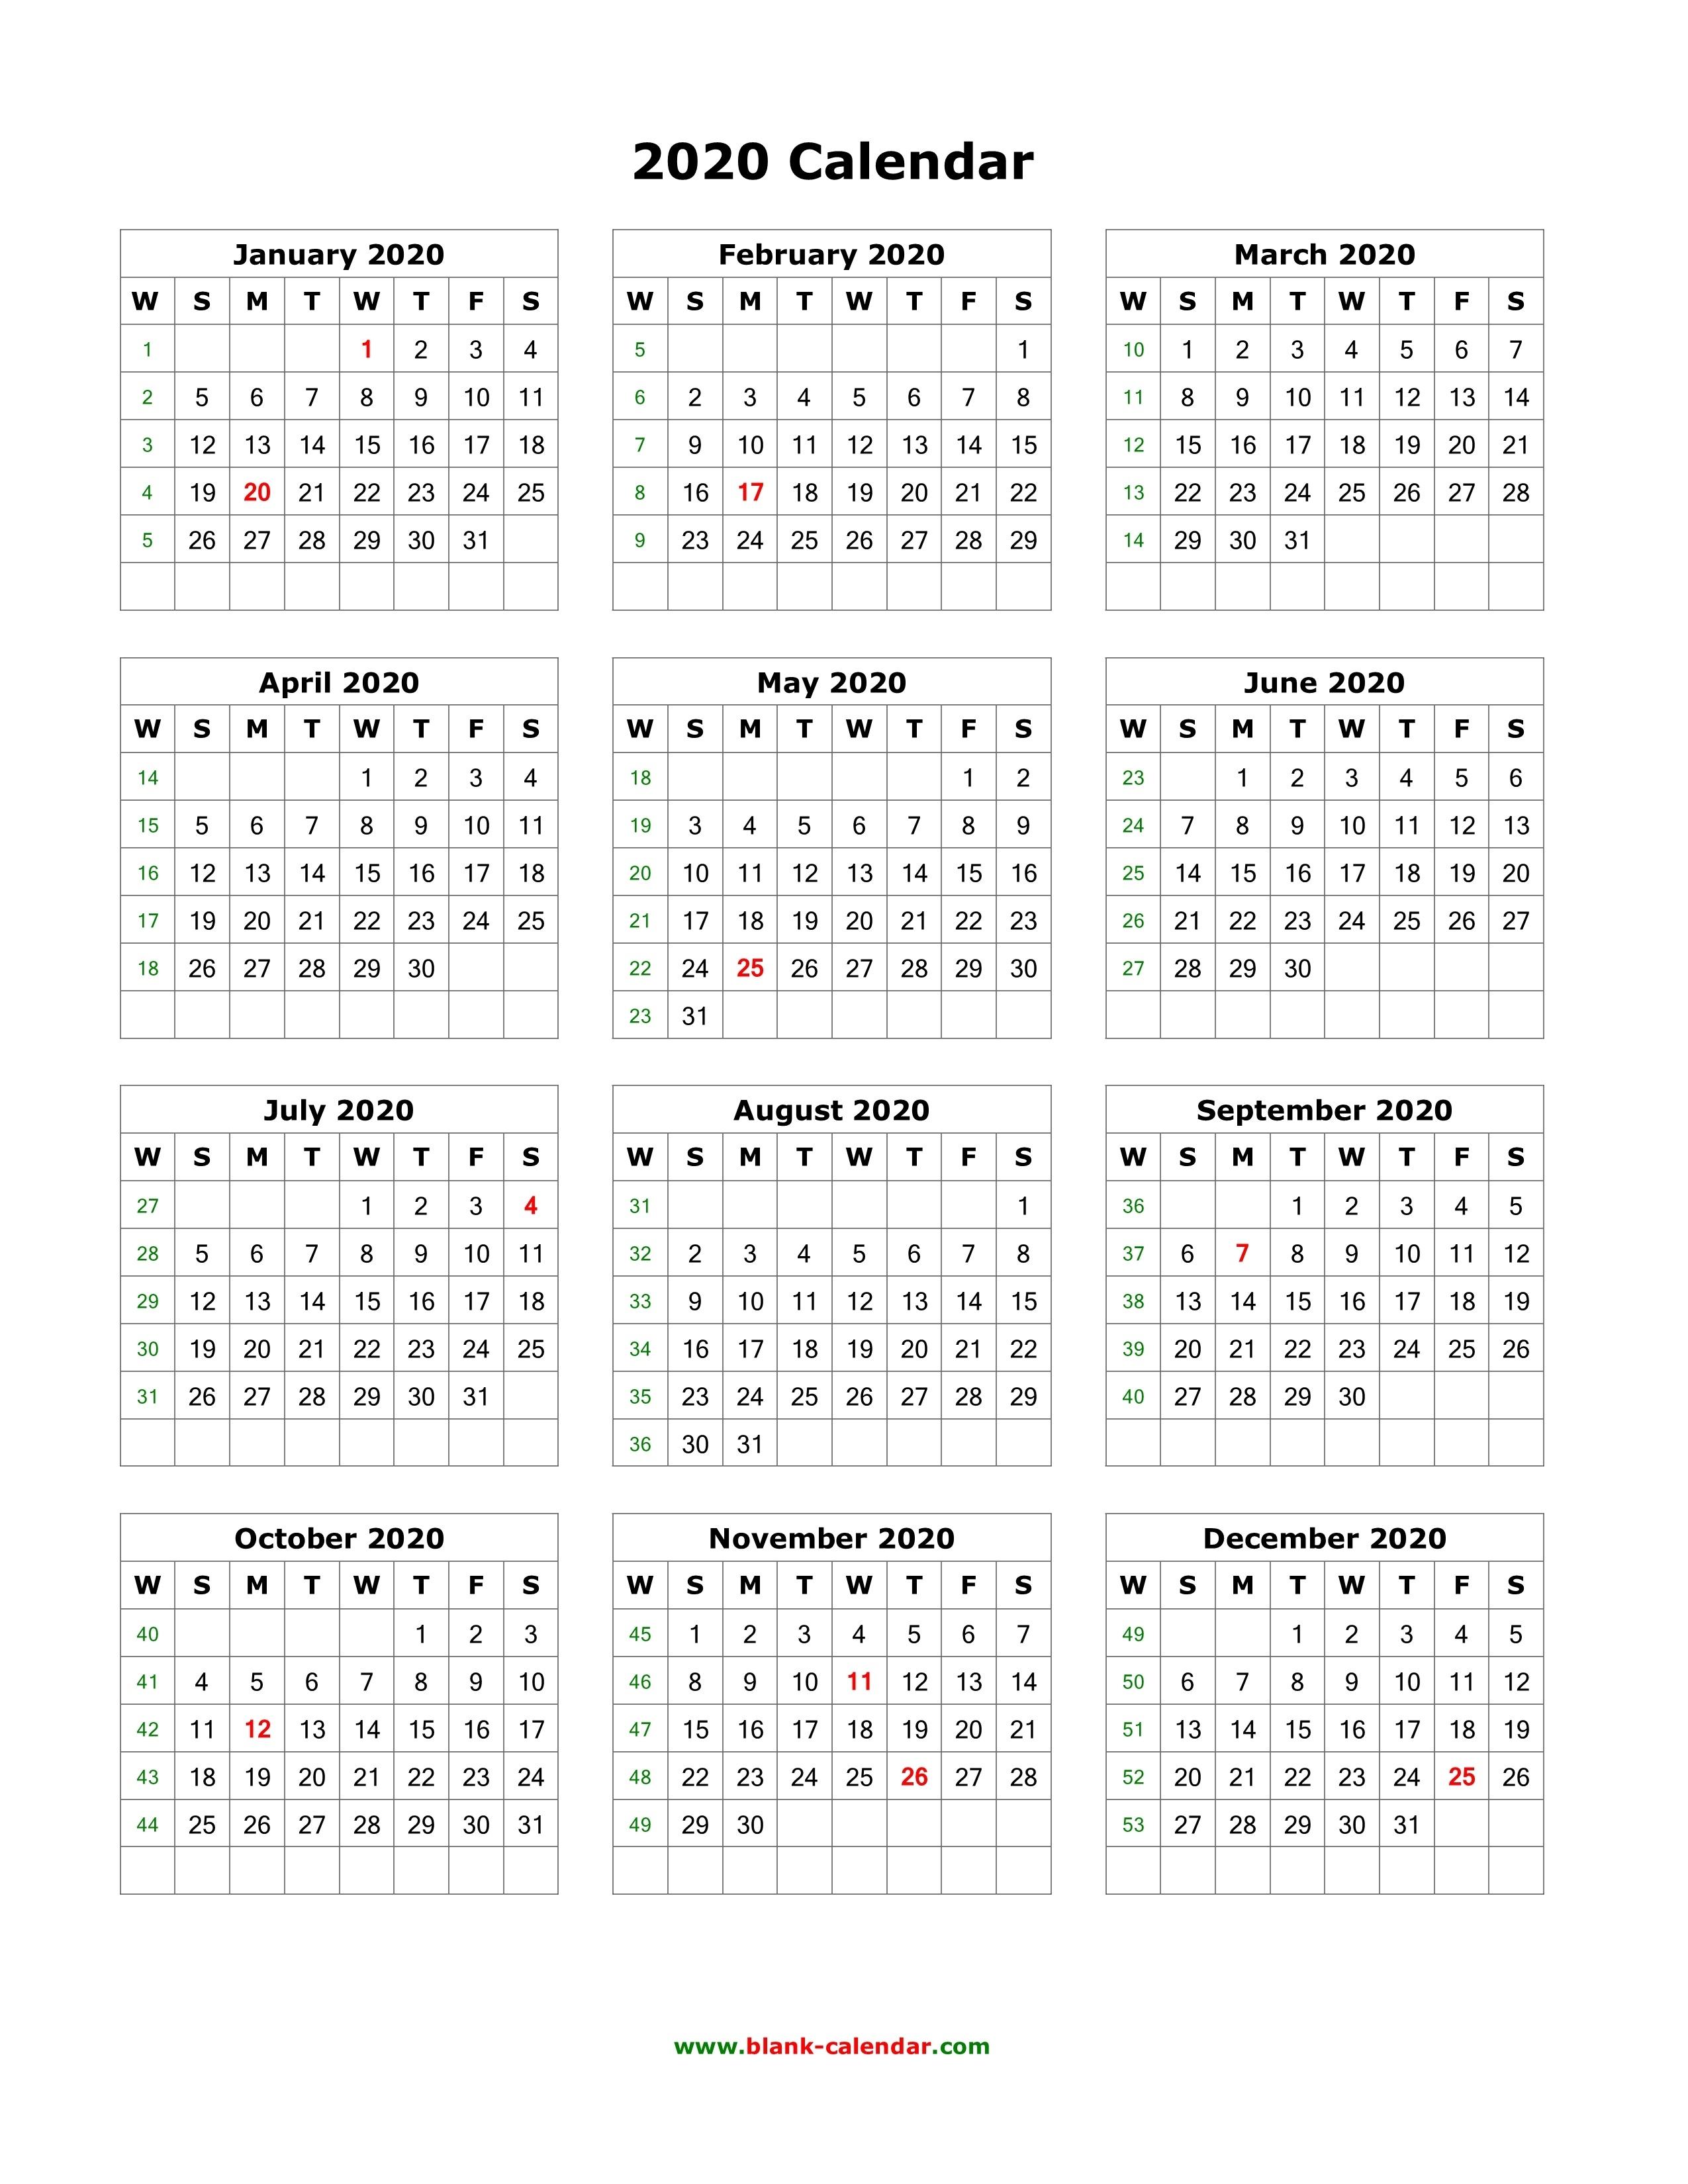 Download Blank Calendar 2020 (12 Months On One Page, Vertical)_Blank Calendar Pdf 2020